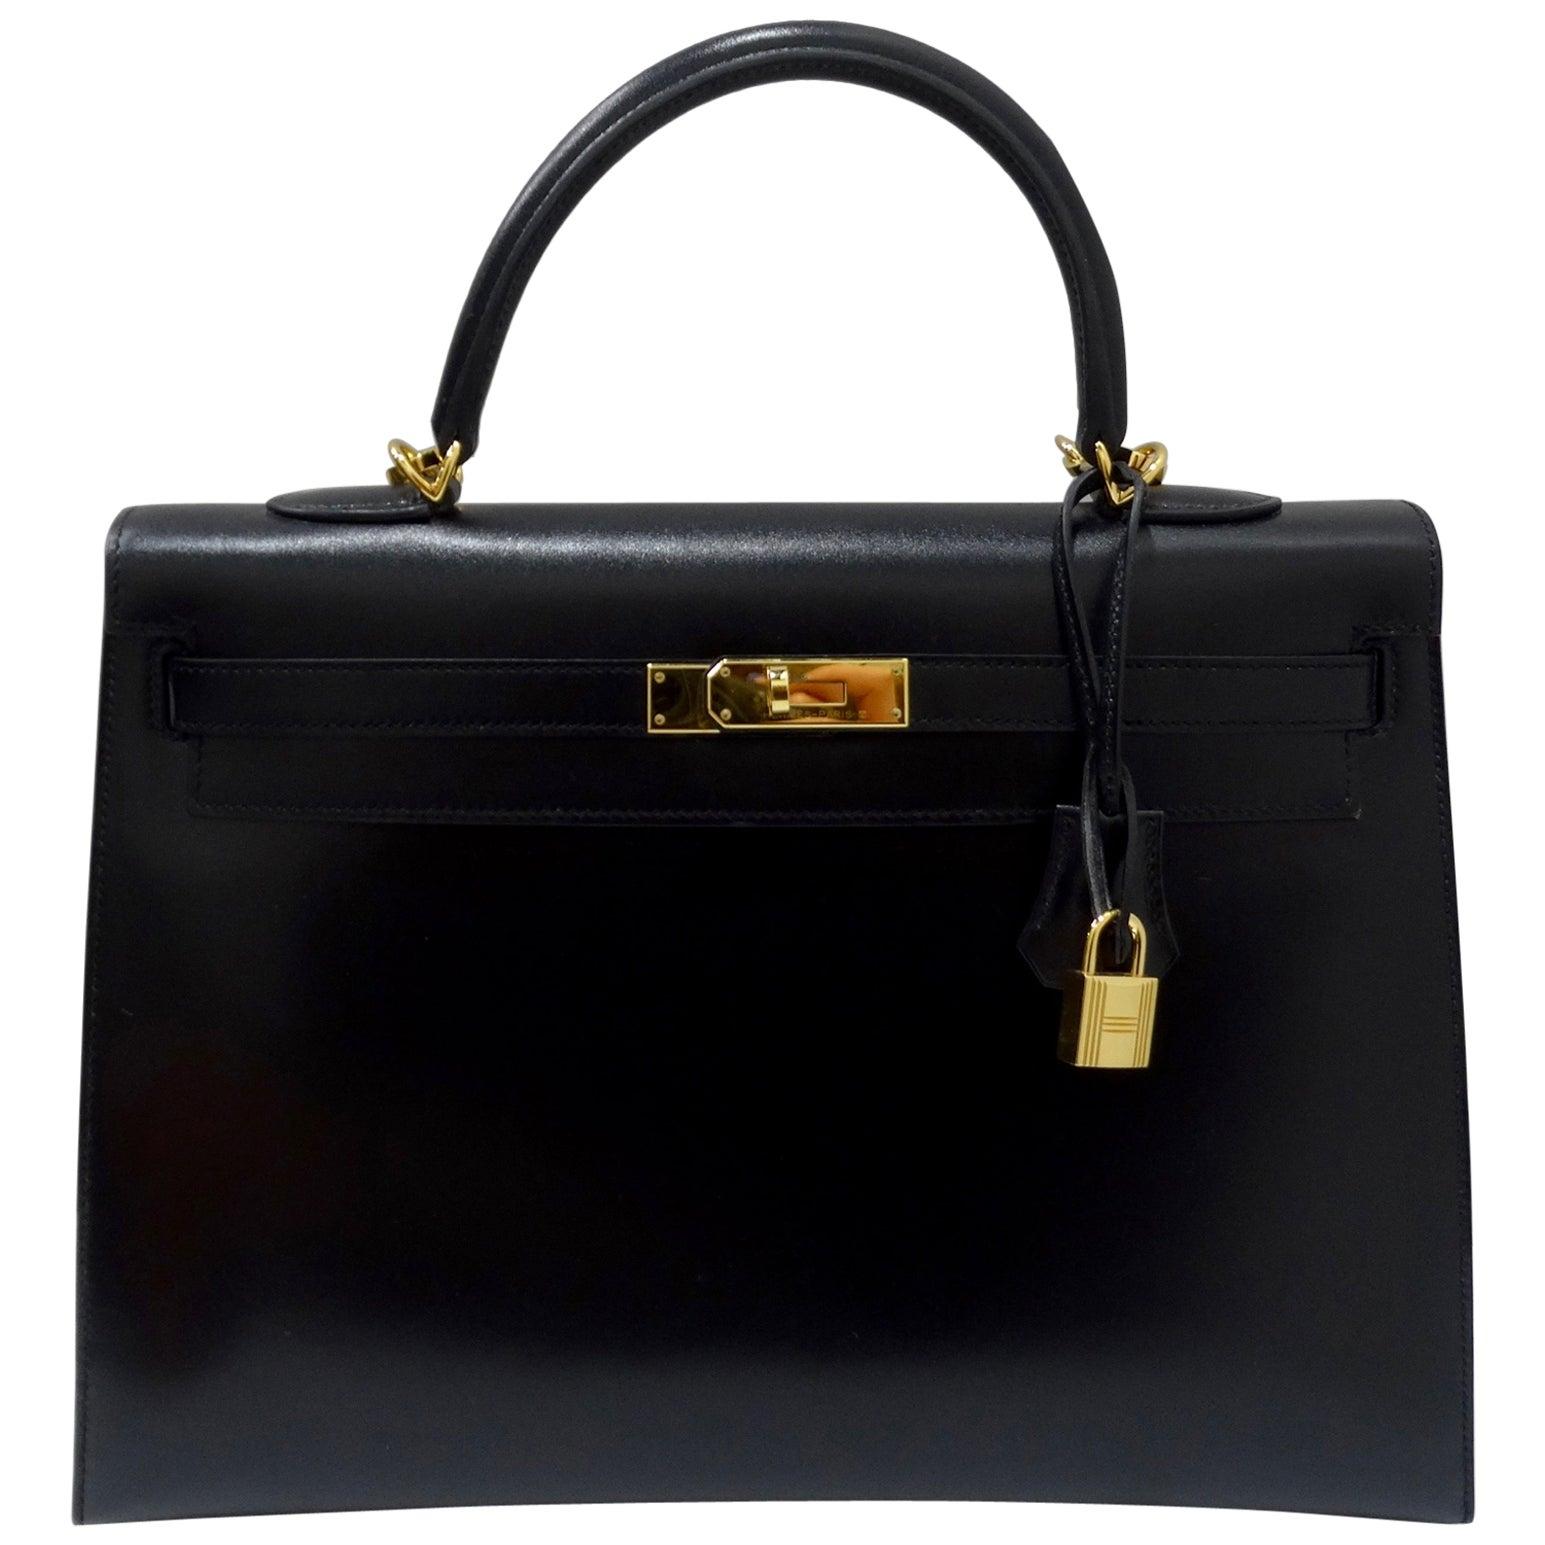 Hermès 2016 Kelly Sellier 35cm Black Box Leather